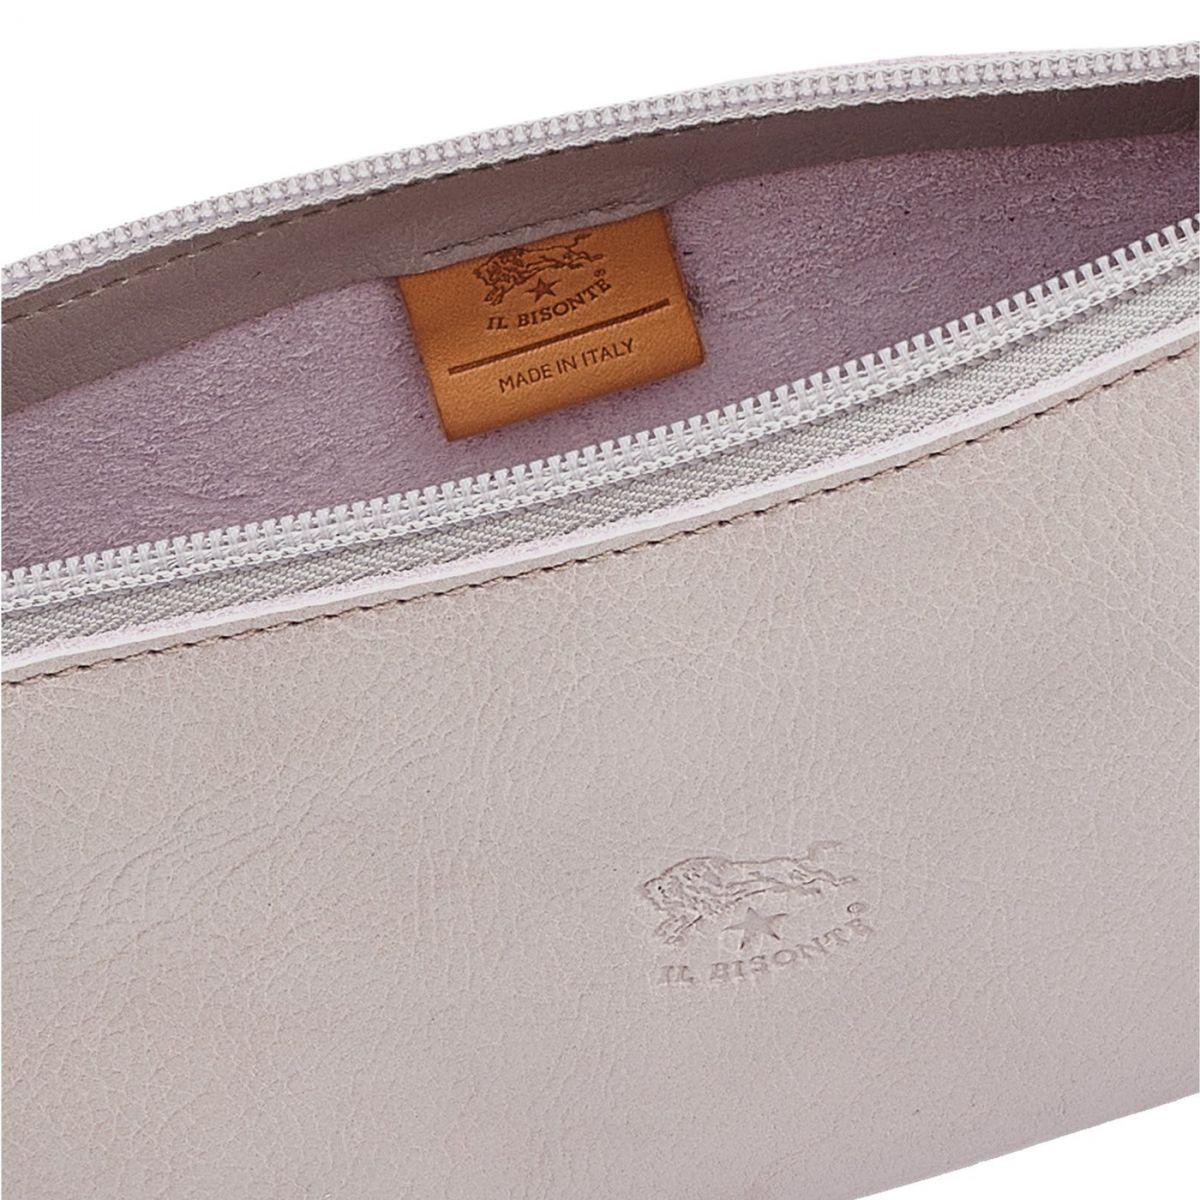 Lucia - Women's Shoulder Bag in Cowhide Leather color Mauve - Salina line BSH091 | Details